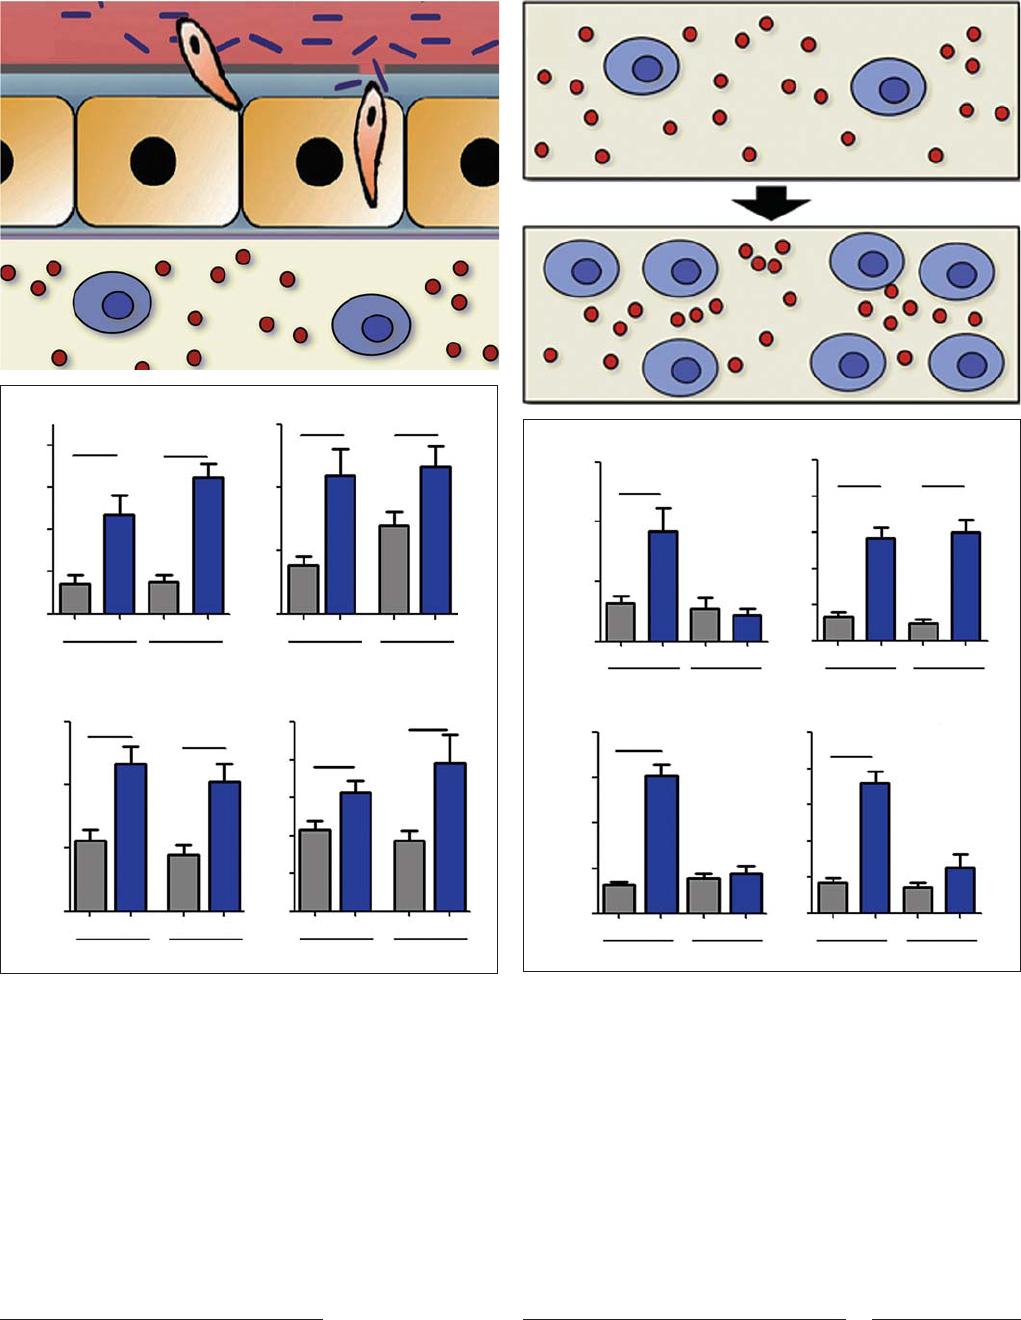 The Role of Hemocytes in Anopheles gambiae Antiplasmodial Immunity.